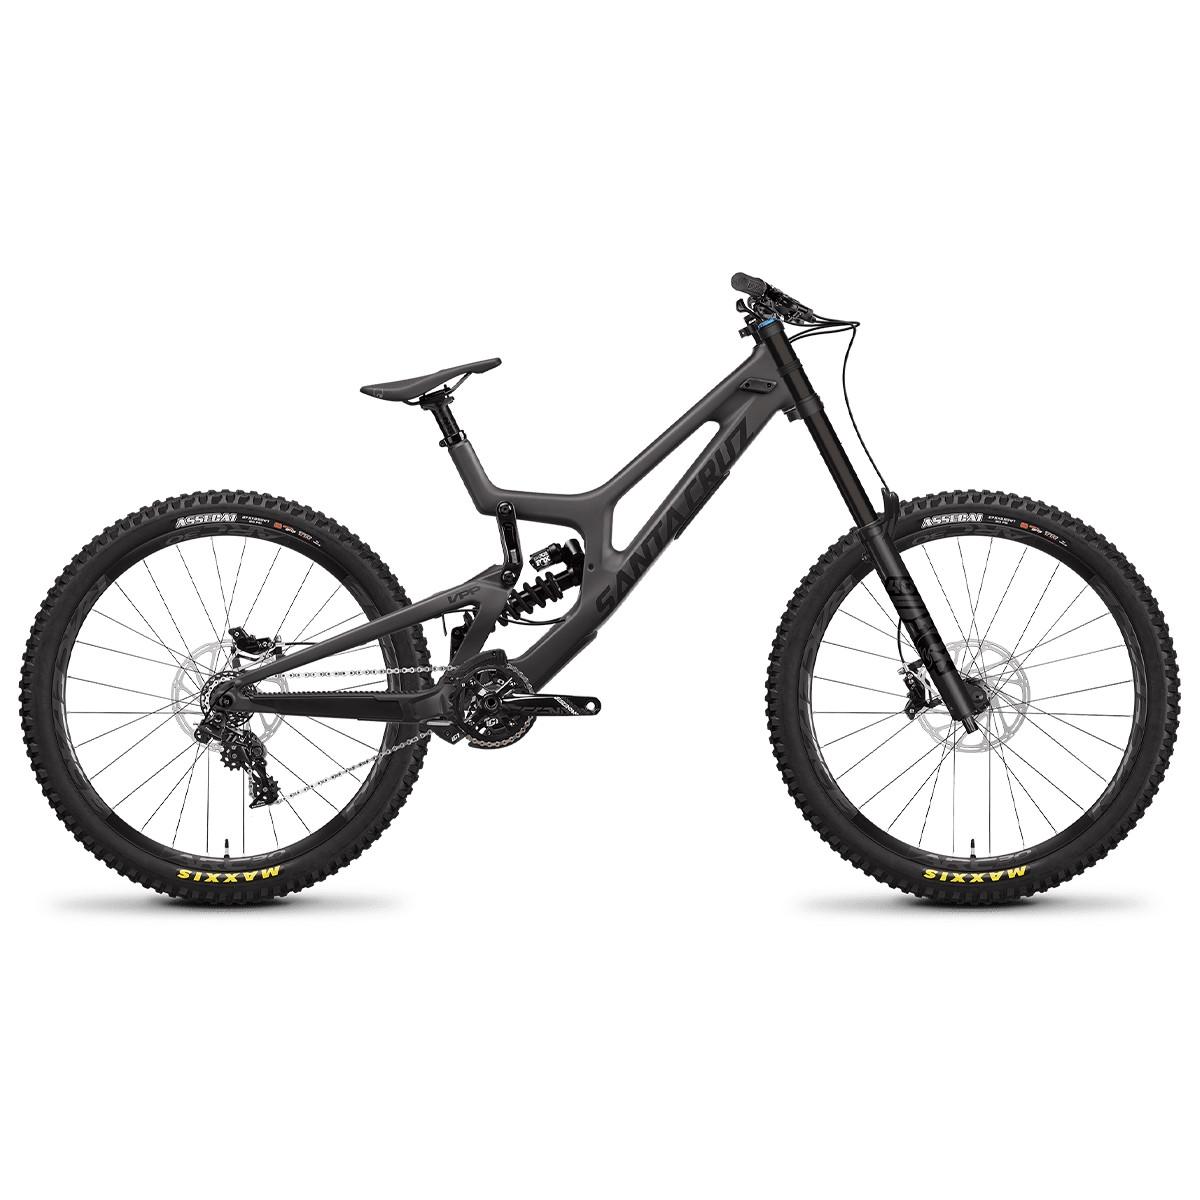 V10 Carbon CC DH S 27.5'' 7s 203mm Grey 2021 Size S